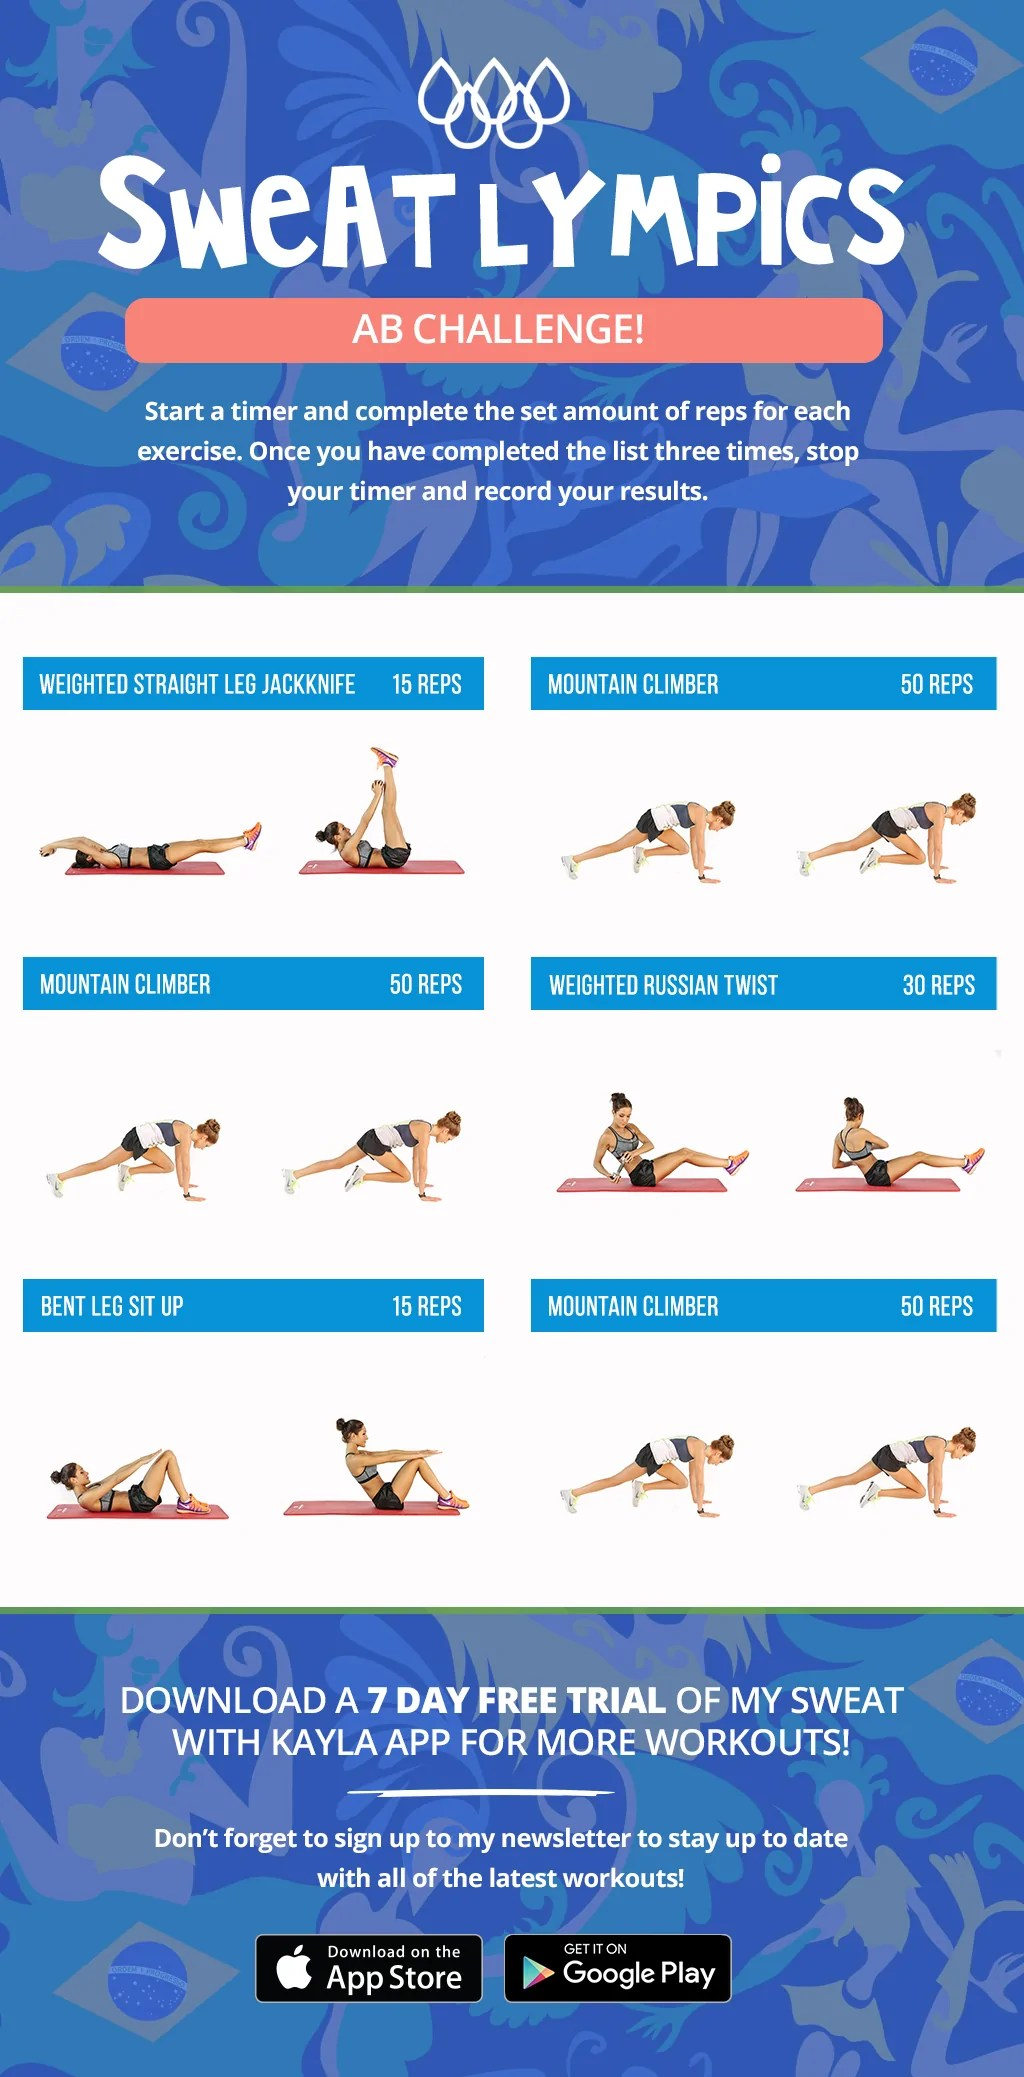 Sweatlympics Ab Challenge! – Kayla Itsines